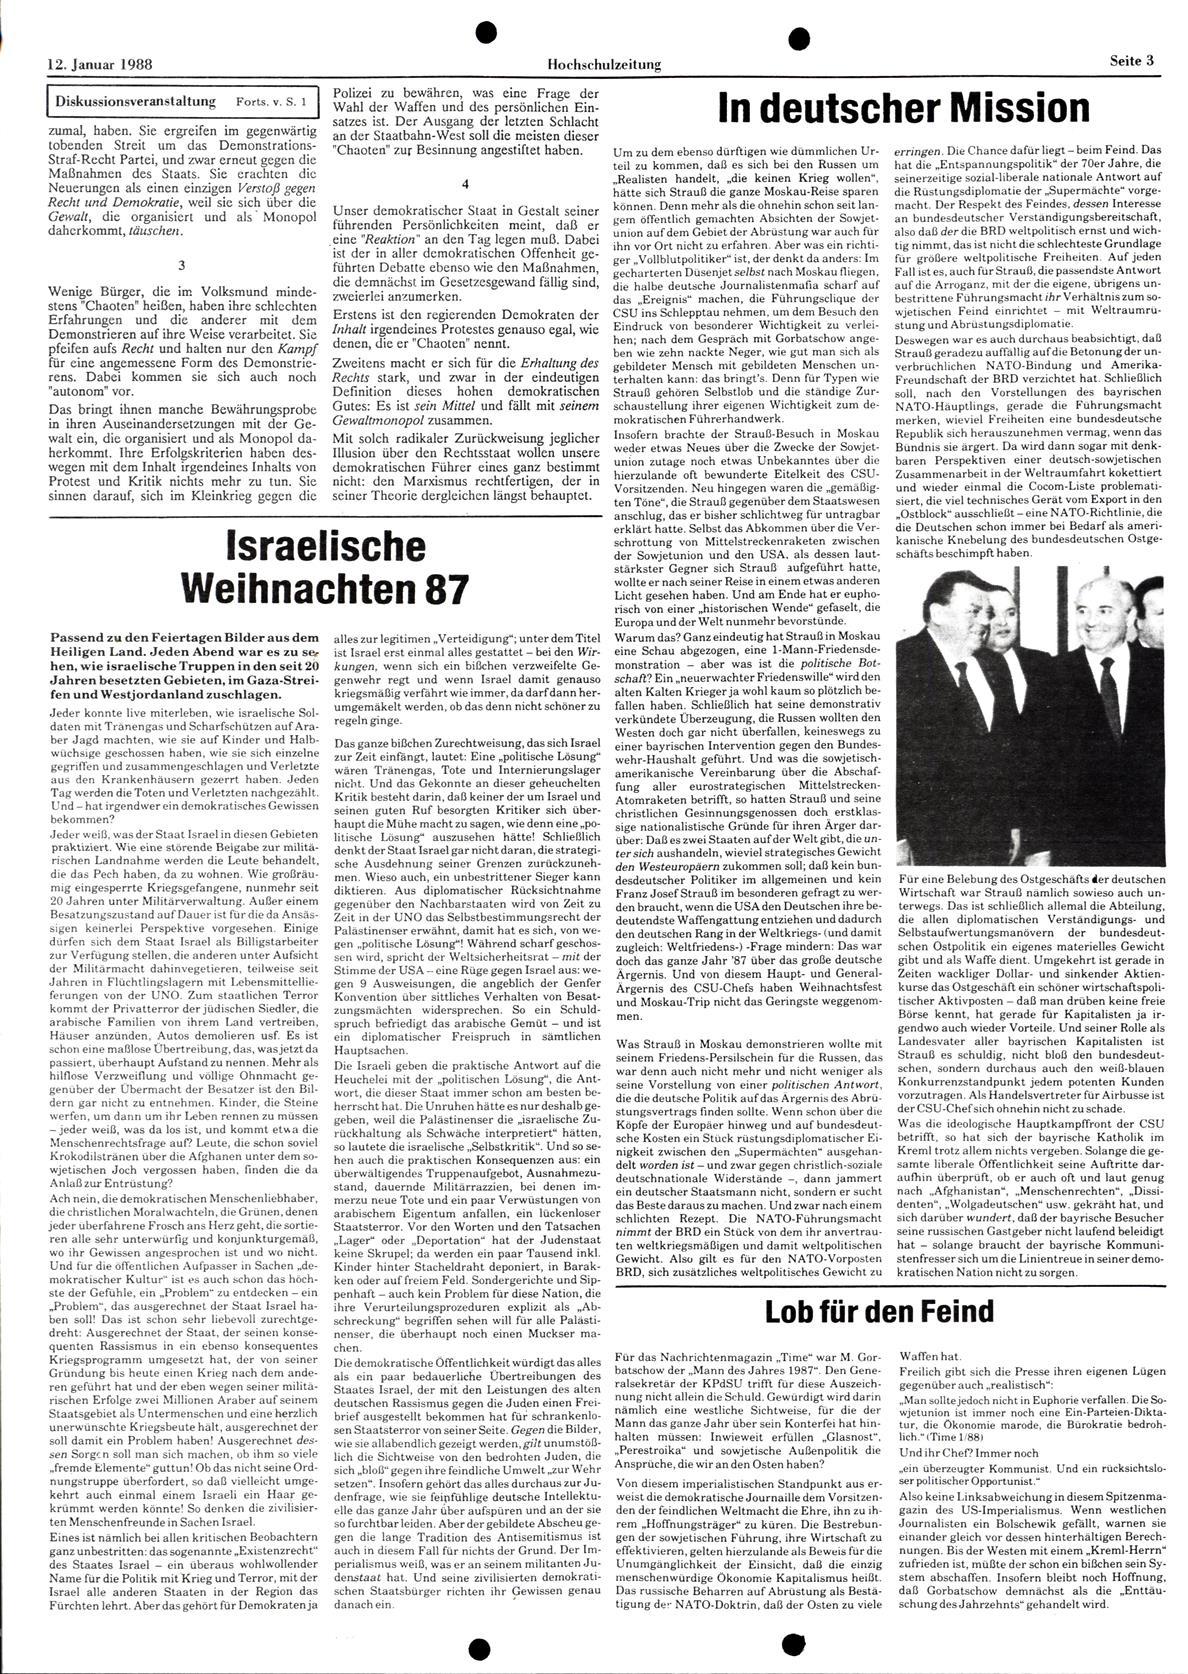 Bochum_BHZ_19880112_162_003